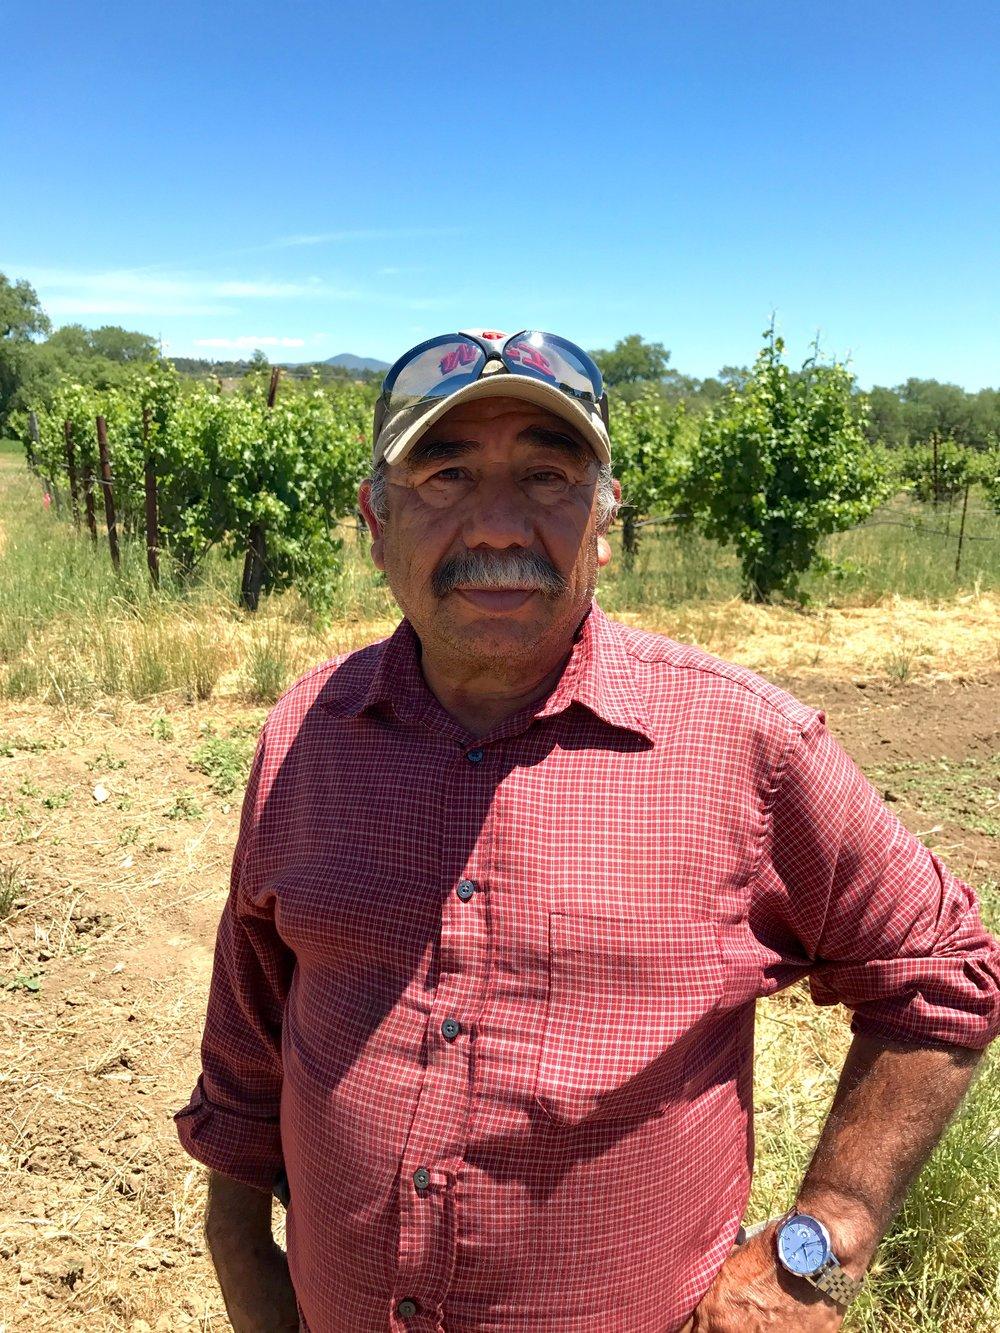 One of honoré's farmers, Jesus, from preston farm & winery, healdsburg, california